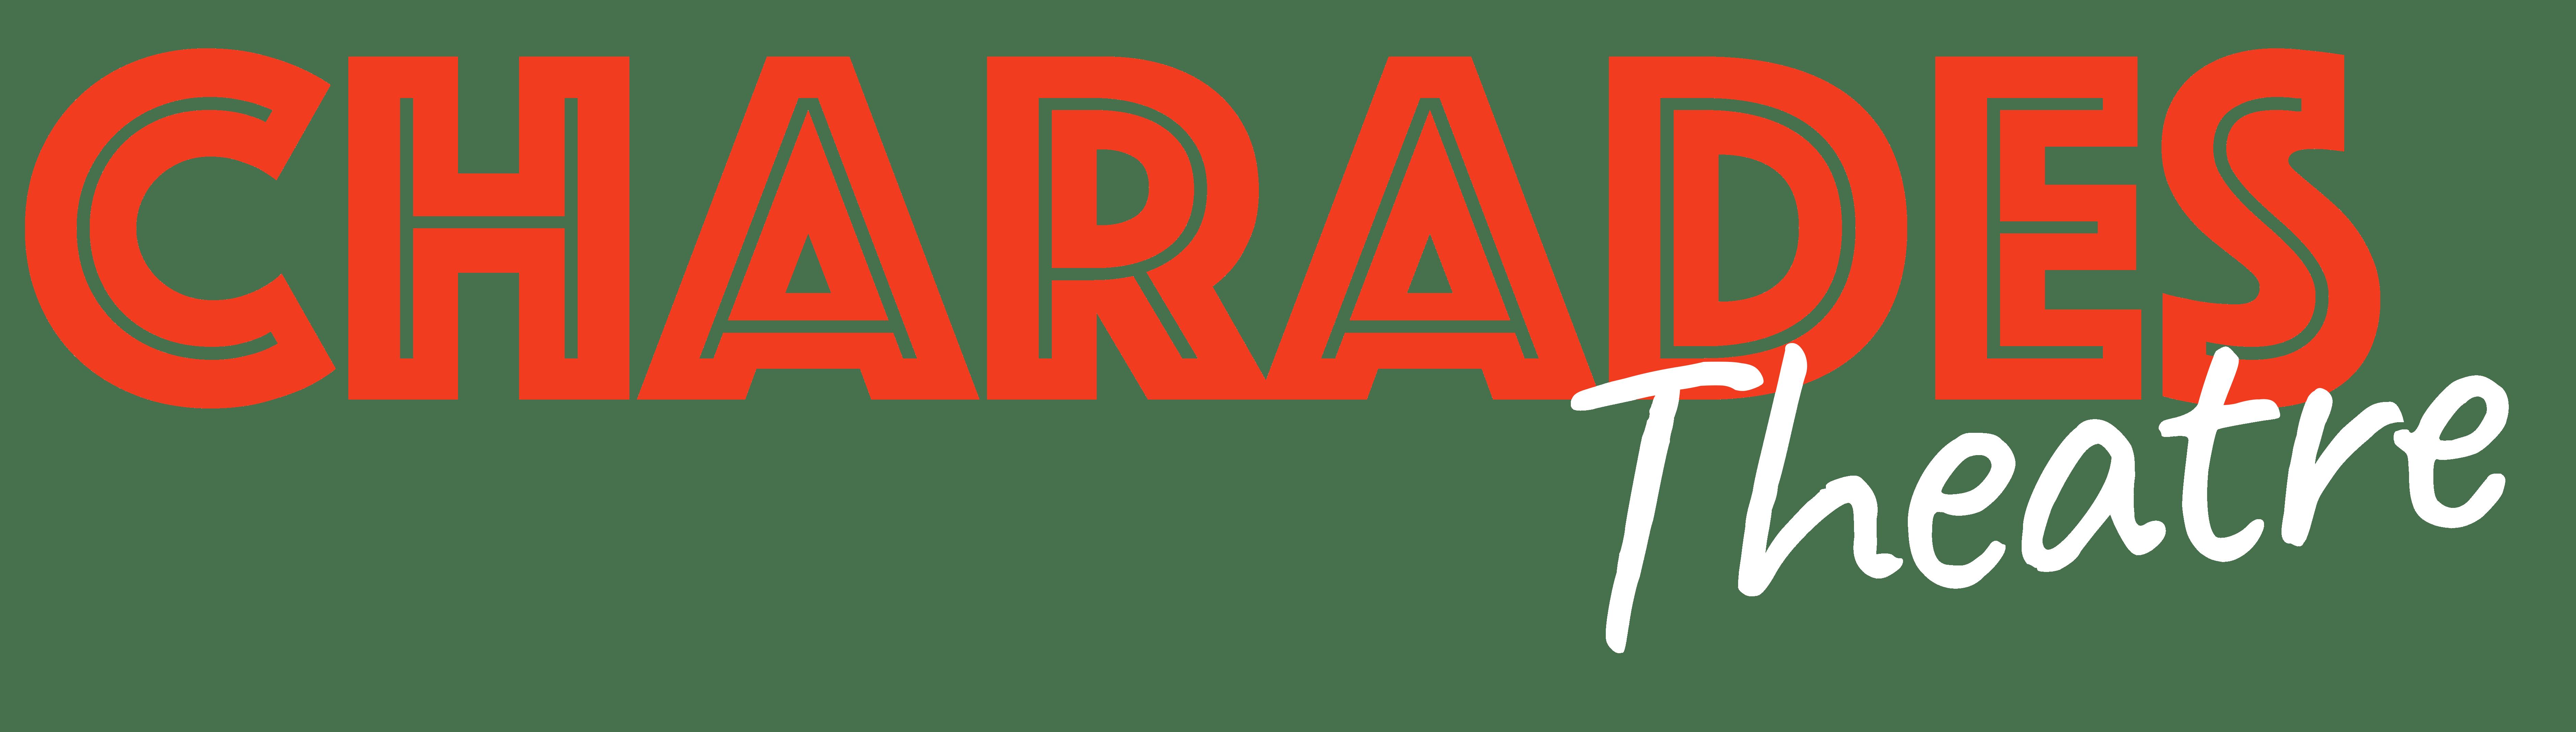 Charades Theatre Company